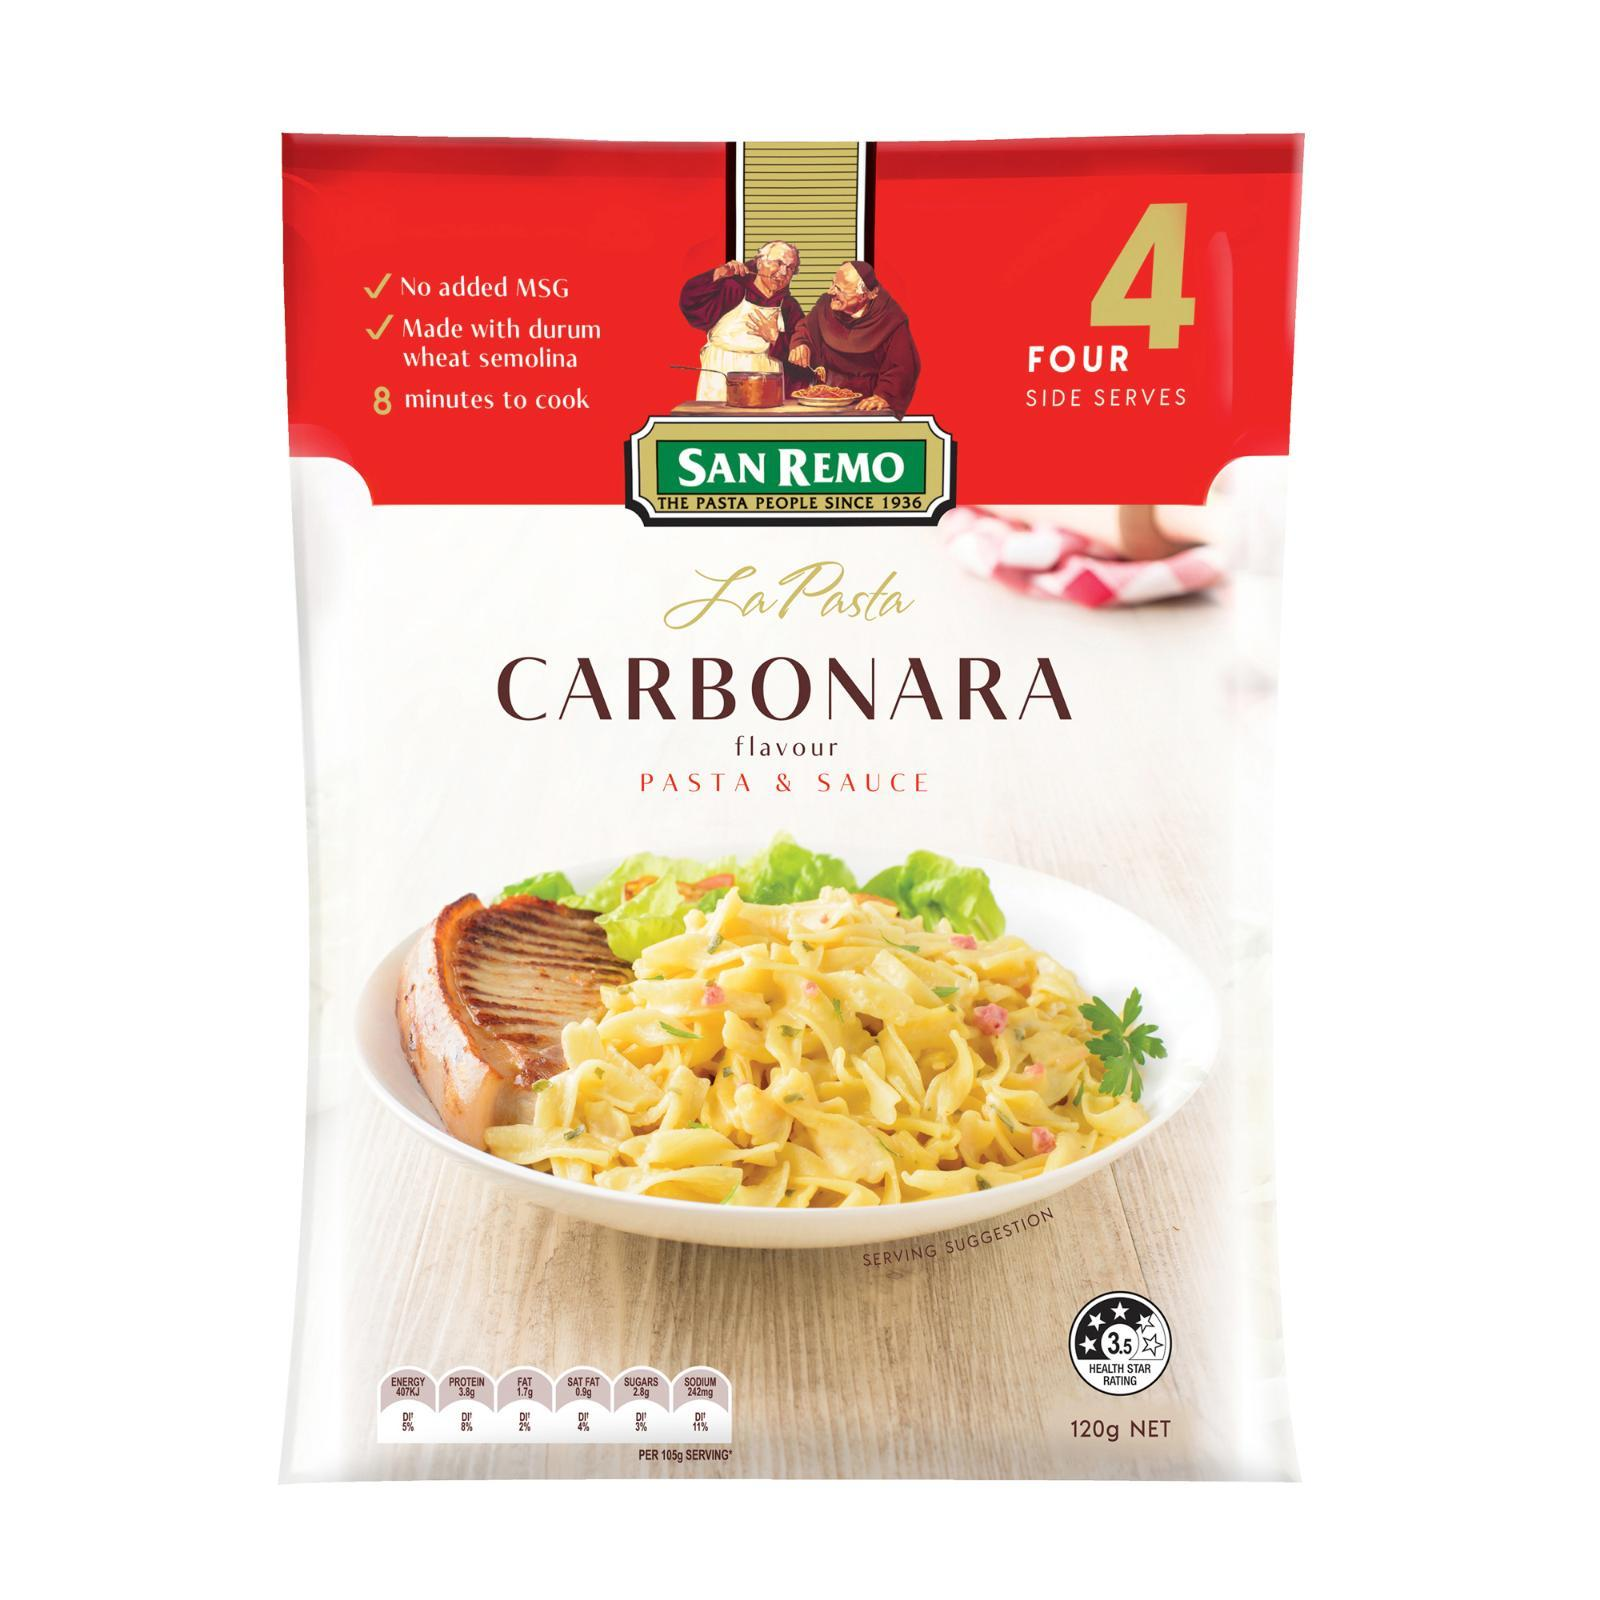 San Remo La Pasta Carbonara Flavour Pasta and Sauce